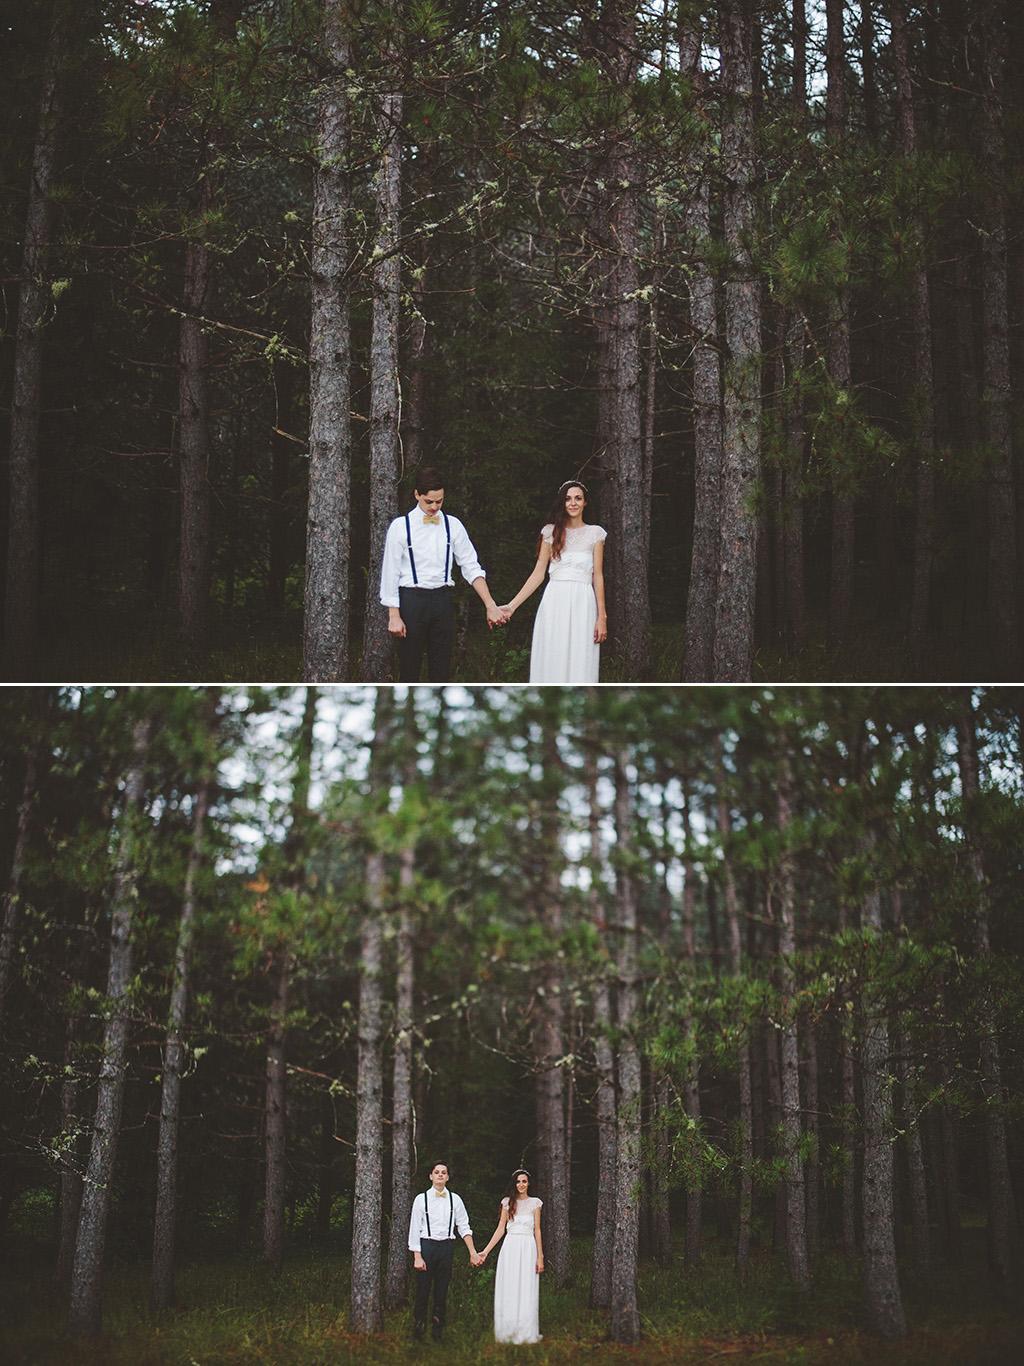 DIY woodland wedding in Maine bride and groom portrait